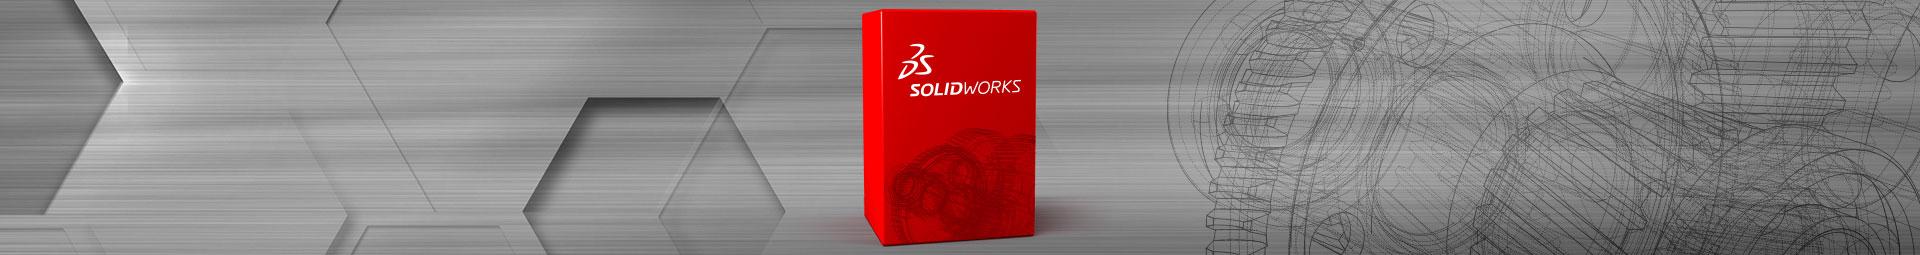 SOLIDWORKS Kurulum/Aktivasyon